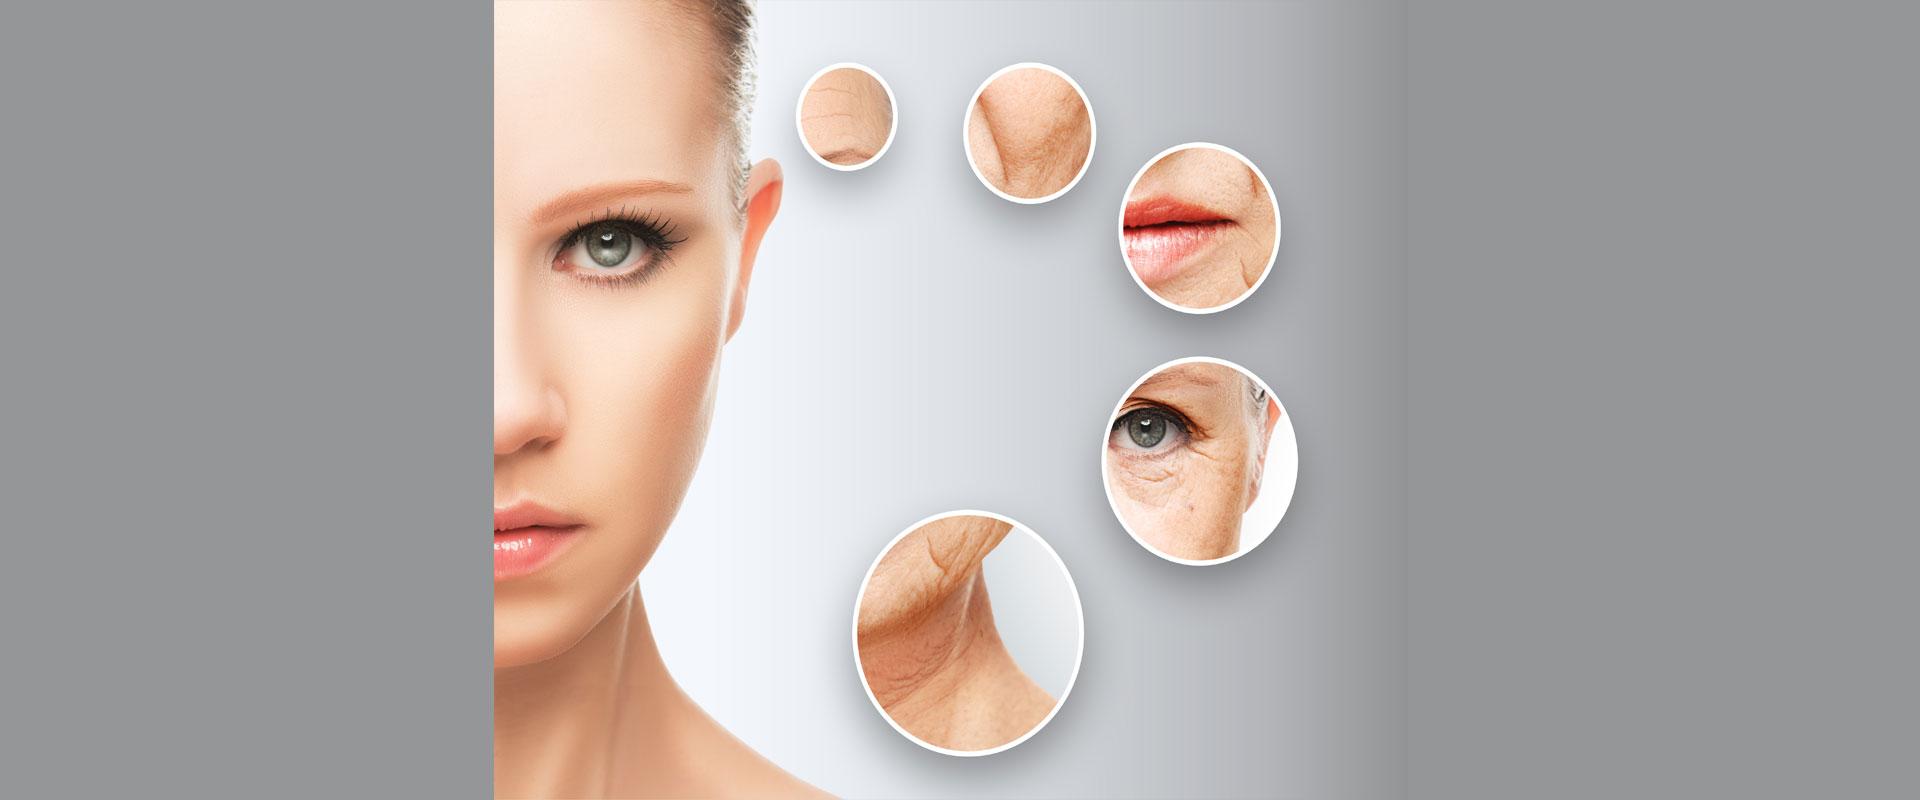 Facial enhancement therapy